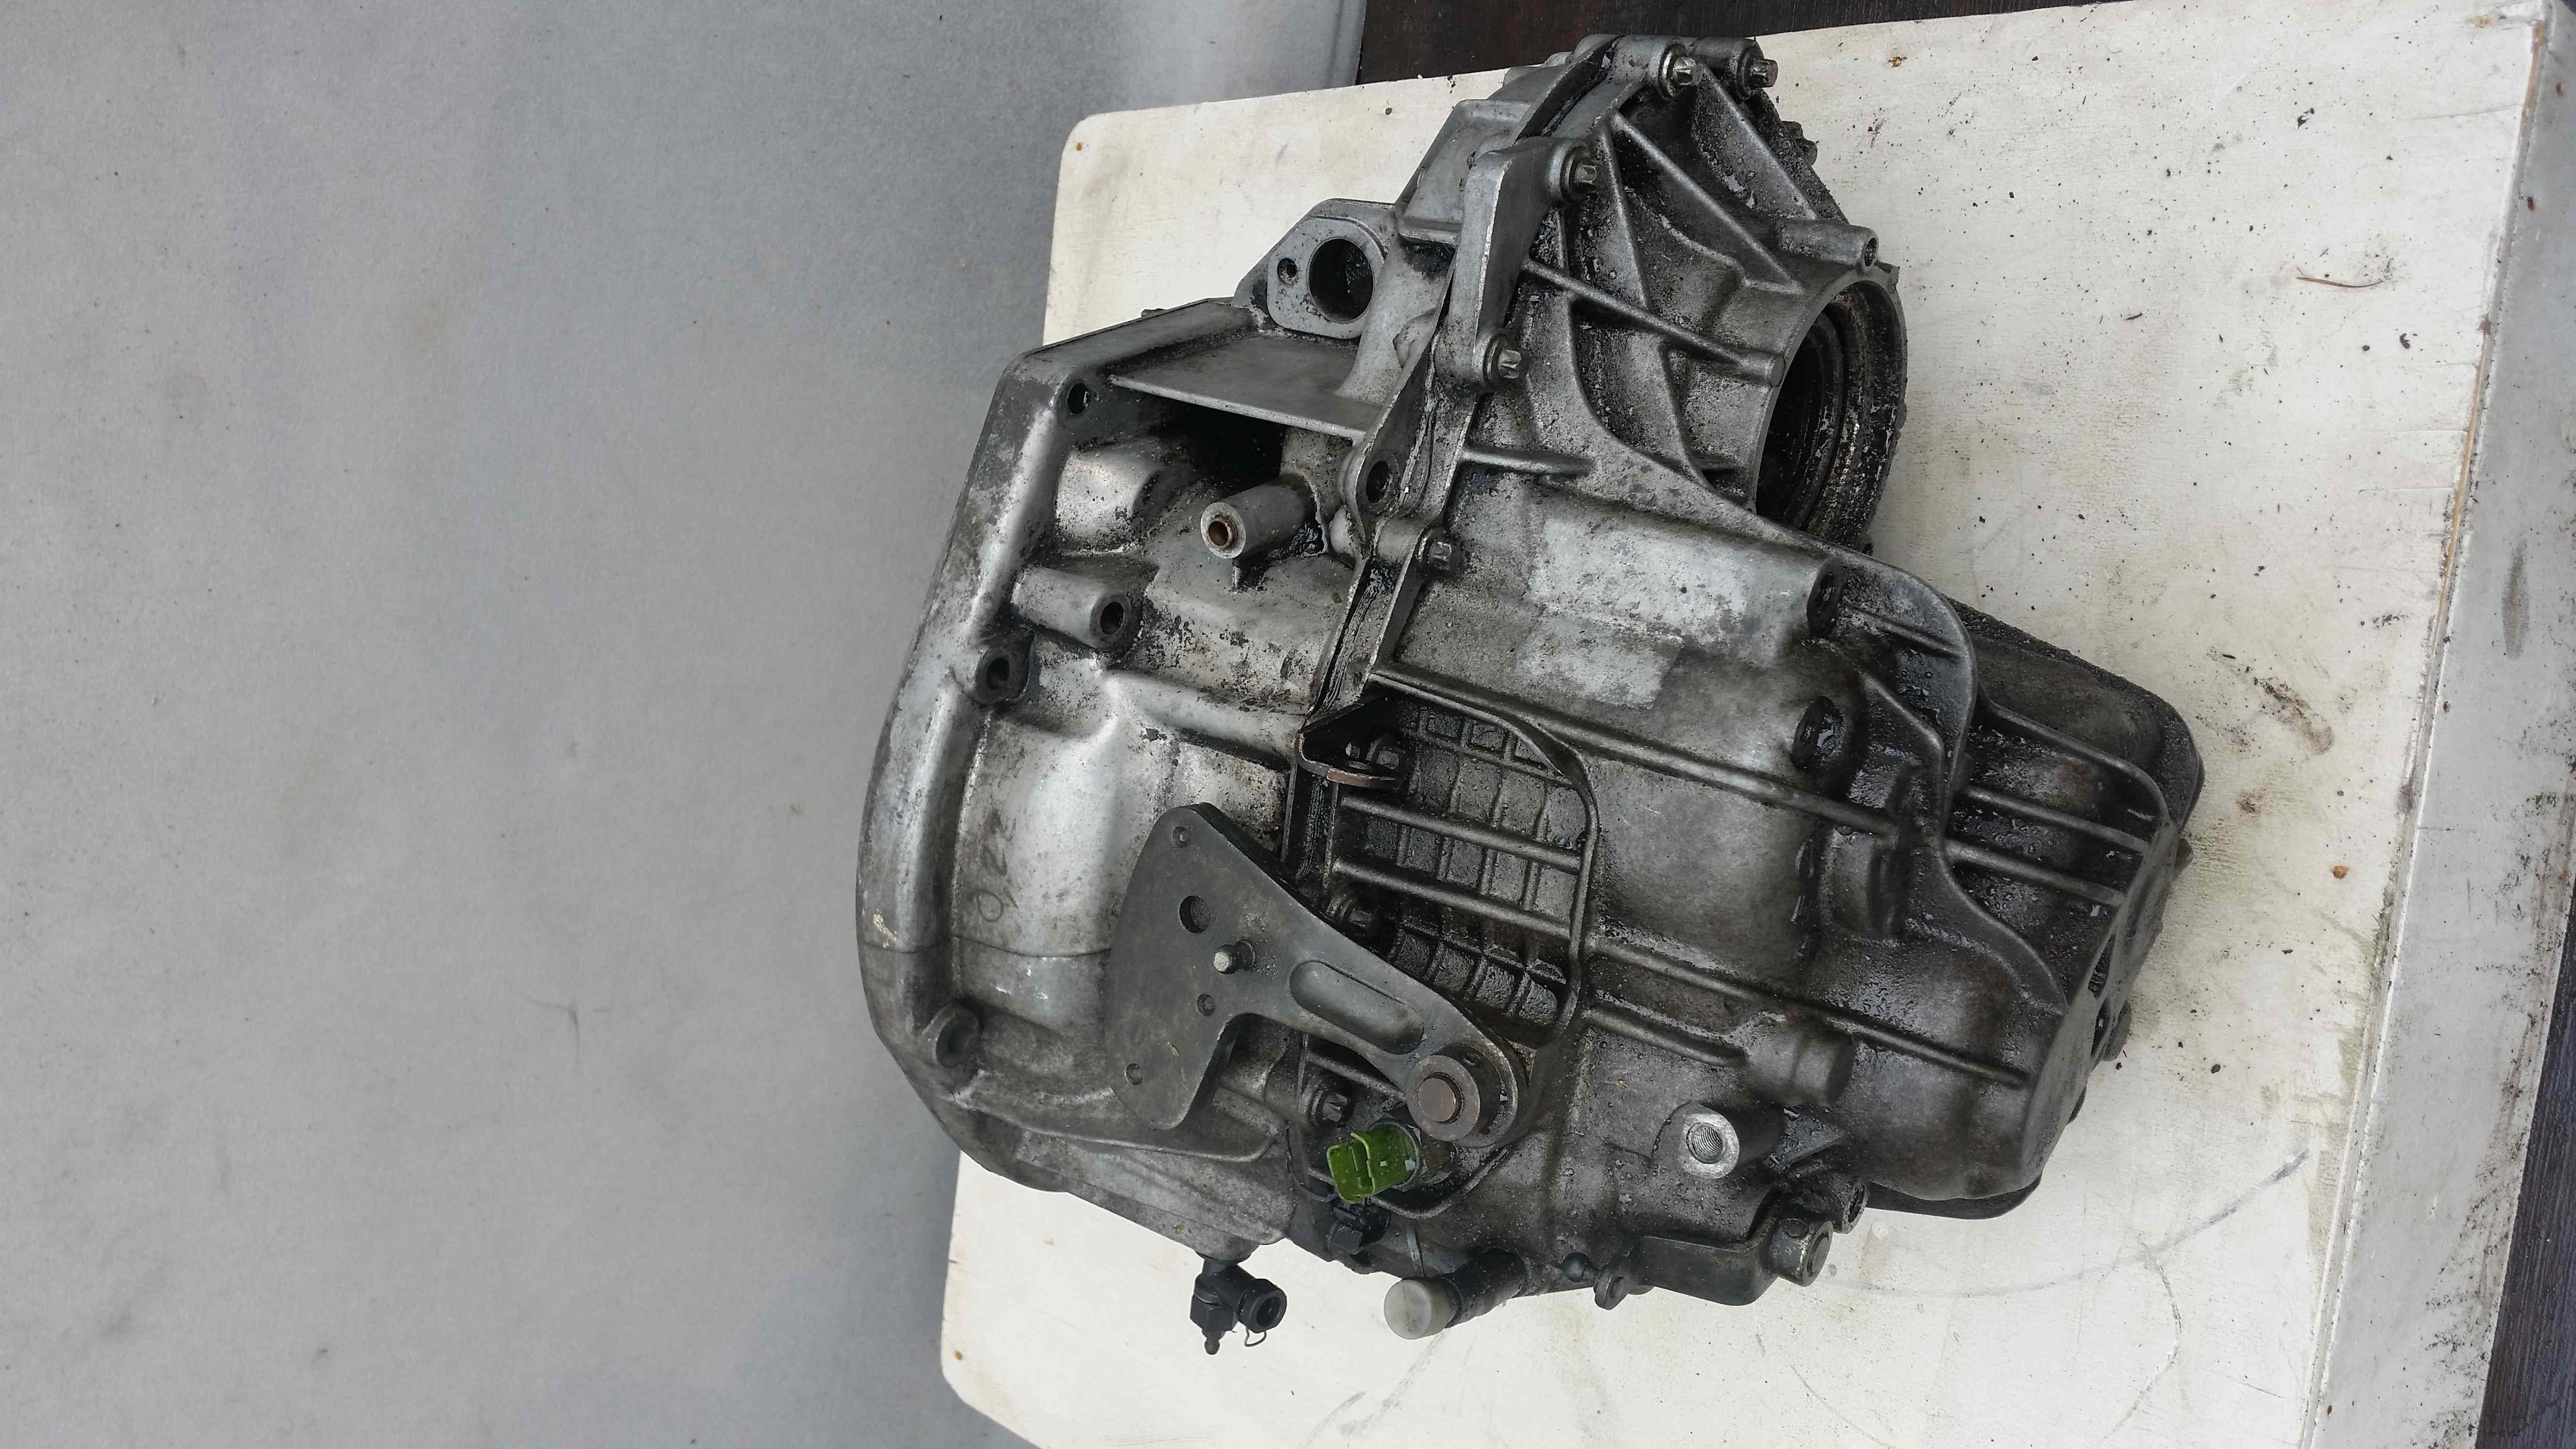 Manual Transmission Gearbox Renault Laguna 1.9dCi Diesel 88 KW F9Q  8200064493, C025581 (Article: 8200064493, C025581)